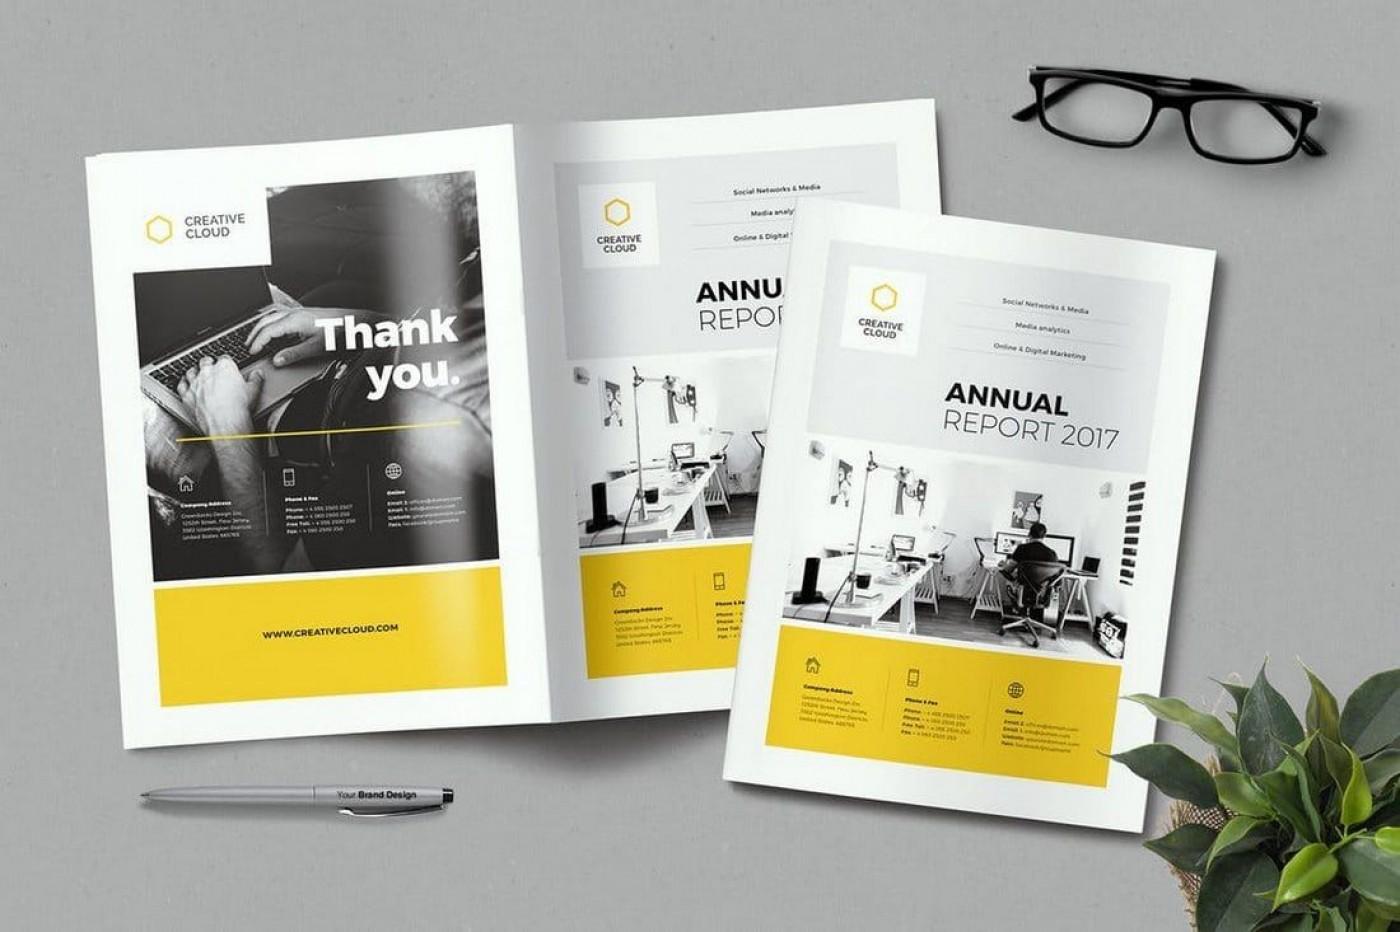 007 Unforgettable Free Annual Report Template Indesign Picture  Adobe Non Profit1400